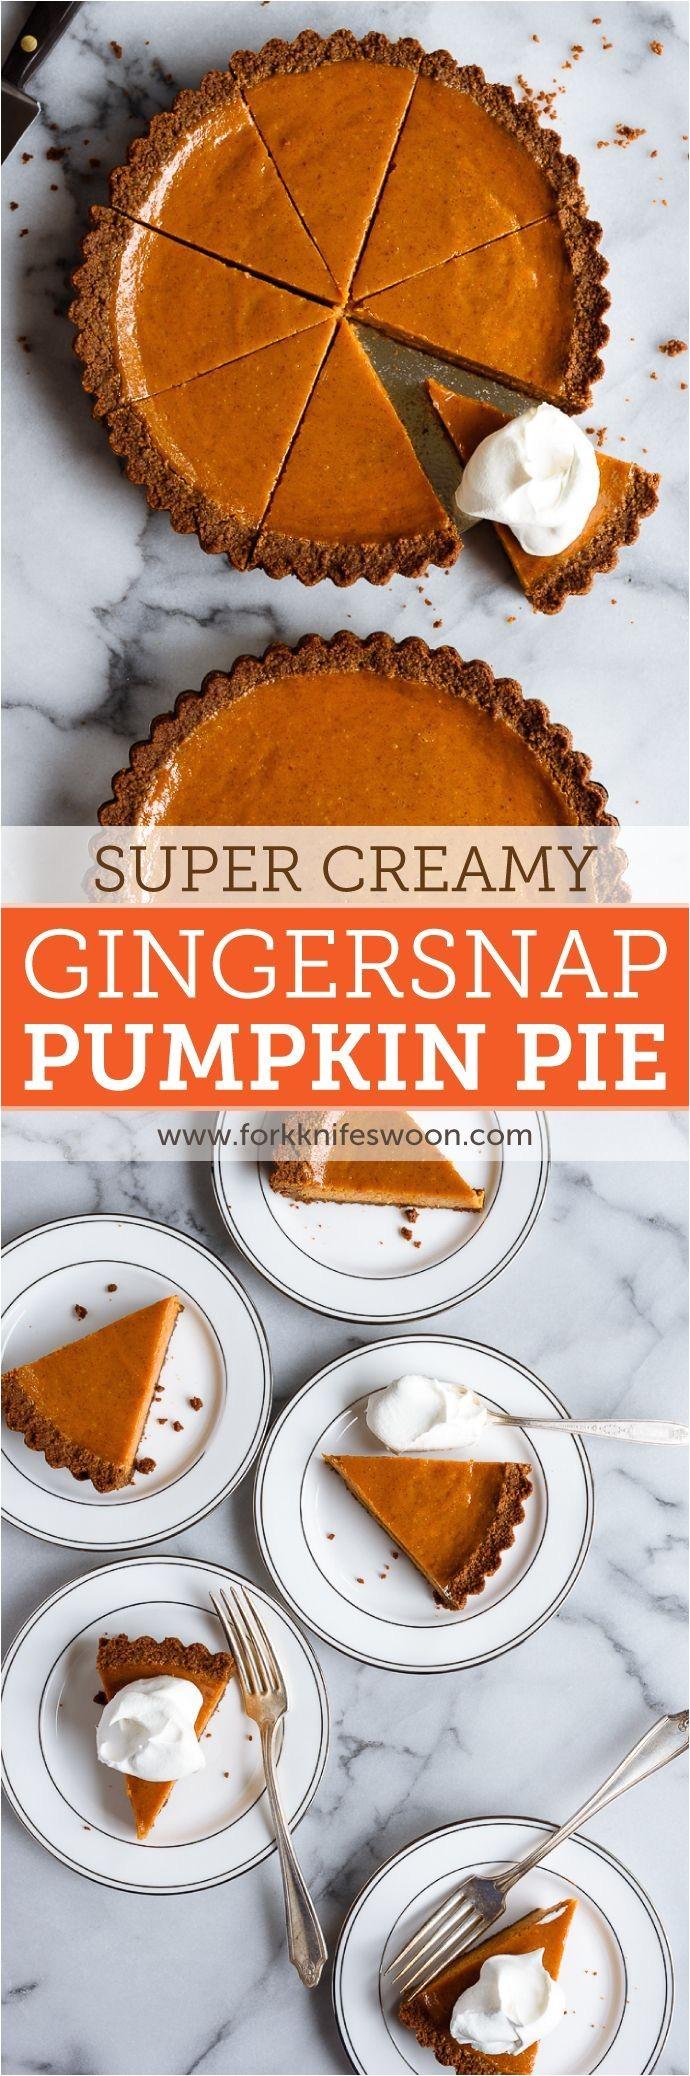 gingersnap pumpkin pie my very favorite smooth and creamy pumpkin pie recipe with a gingersnap